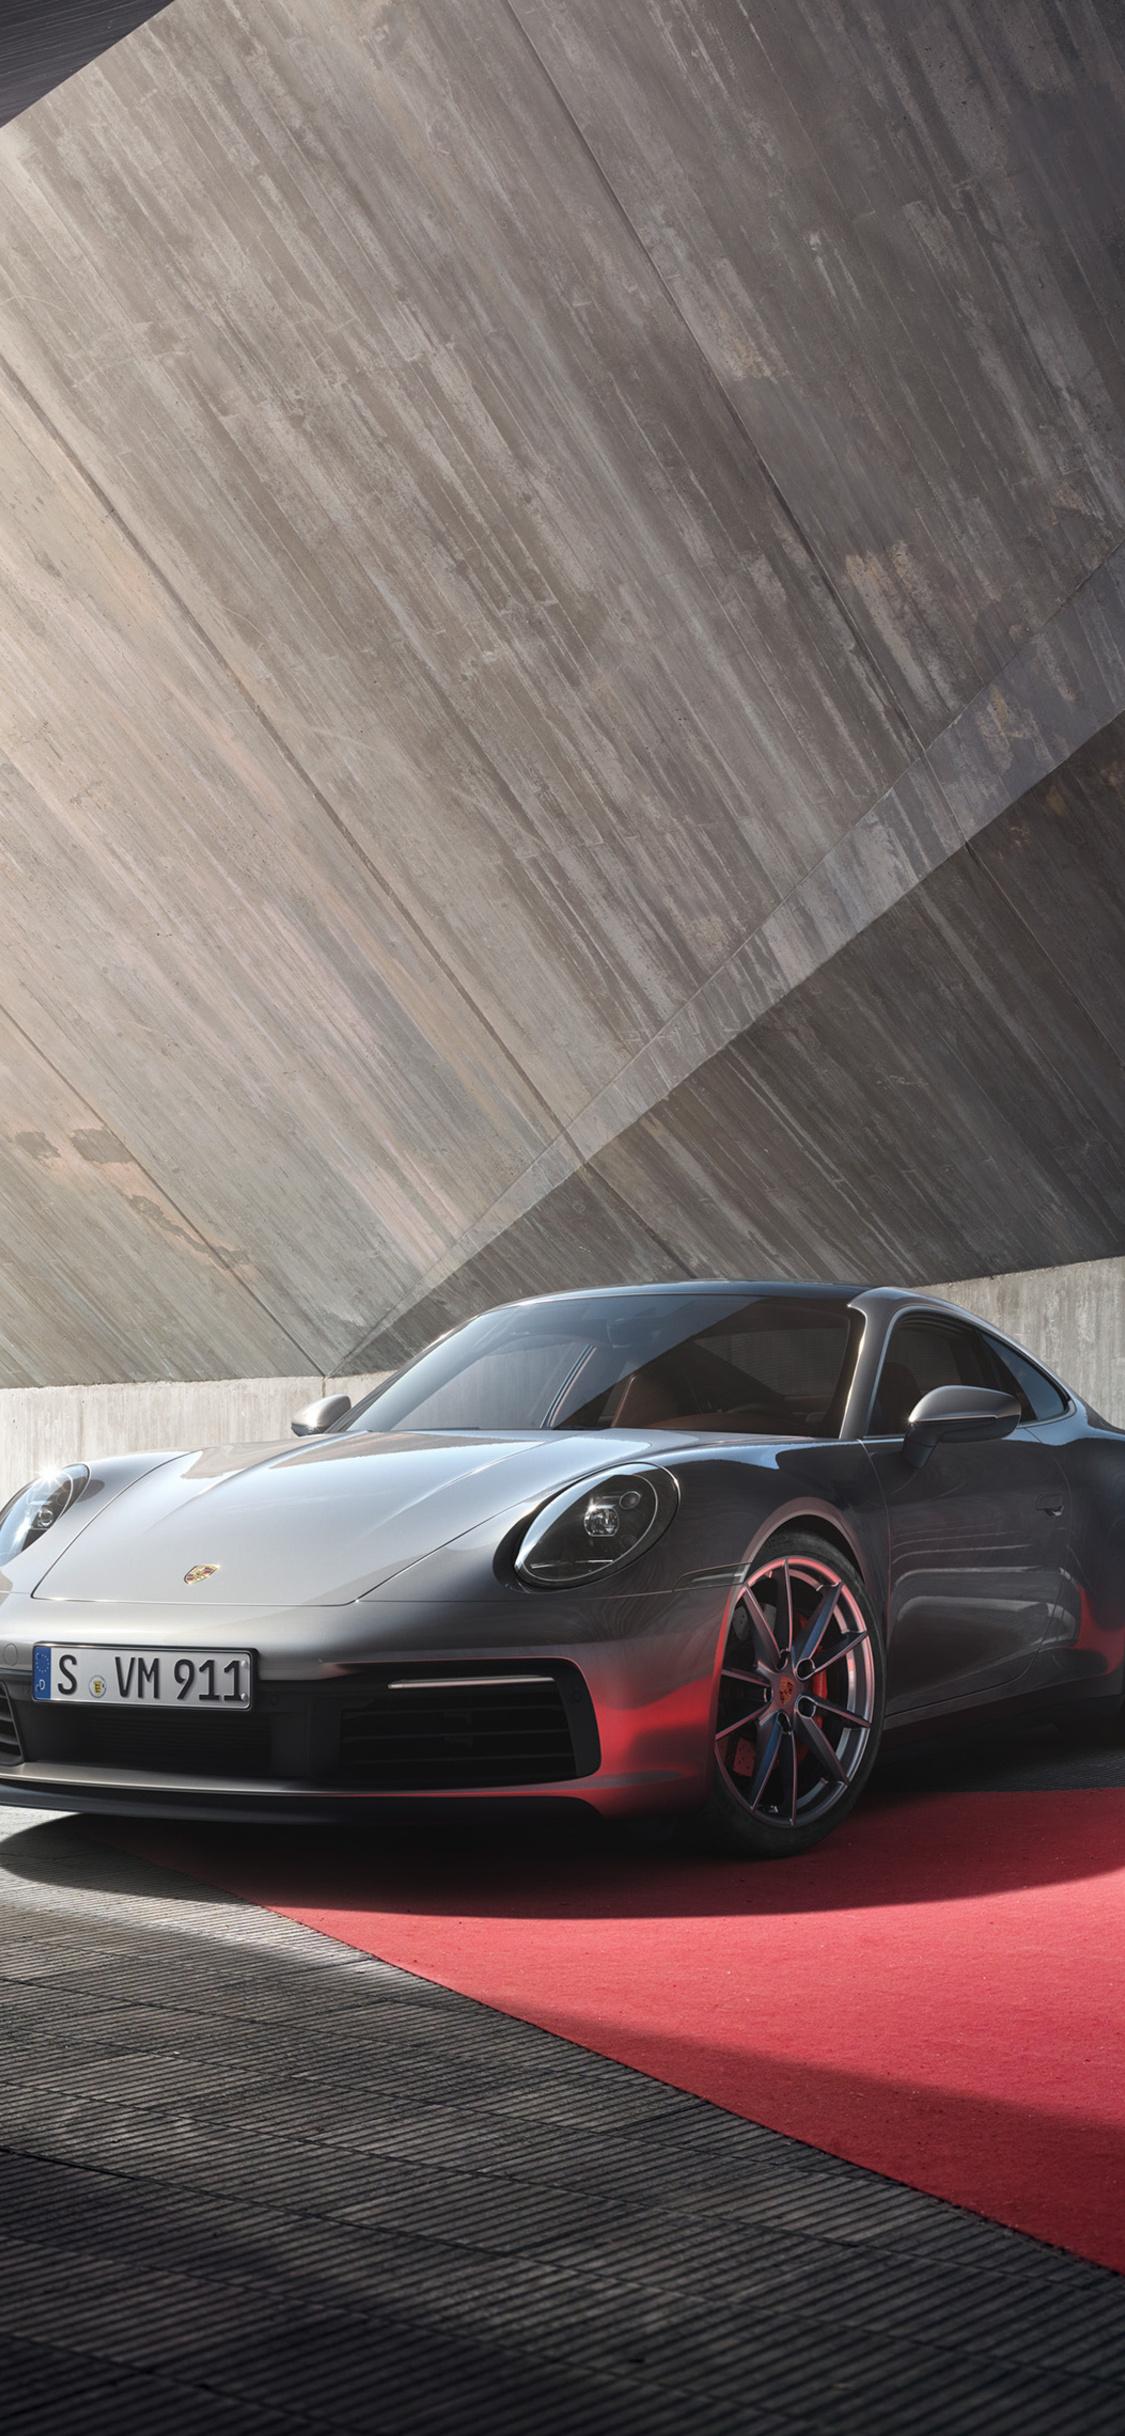 1125x2436 Porsche 911 Front 4k Iphone Xs Iphone 10 Iphone X